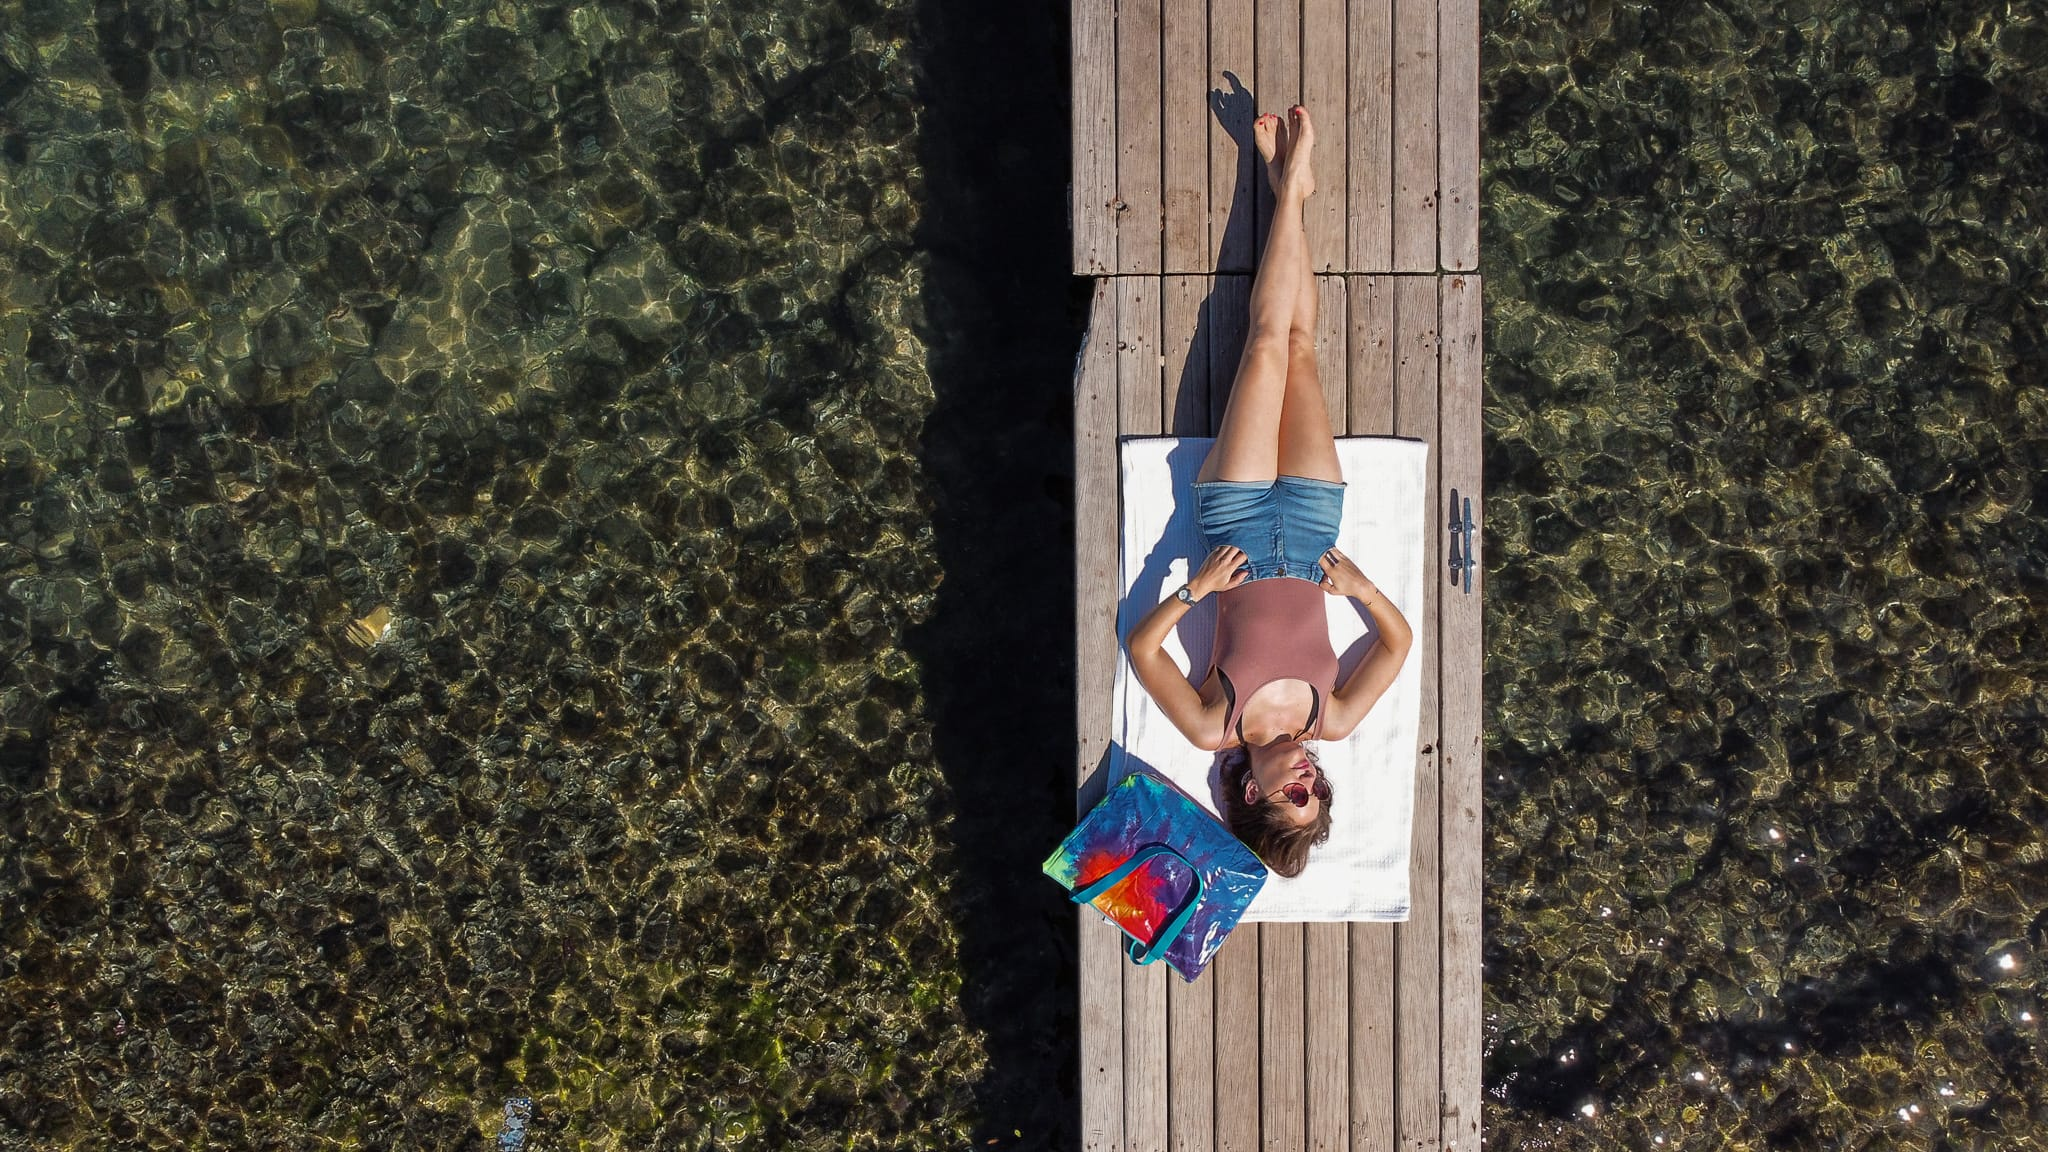 Commercial - Professional photographer on the Côte d'Azur